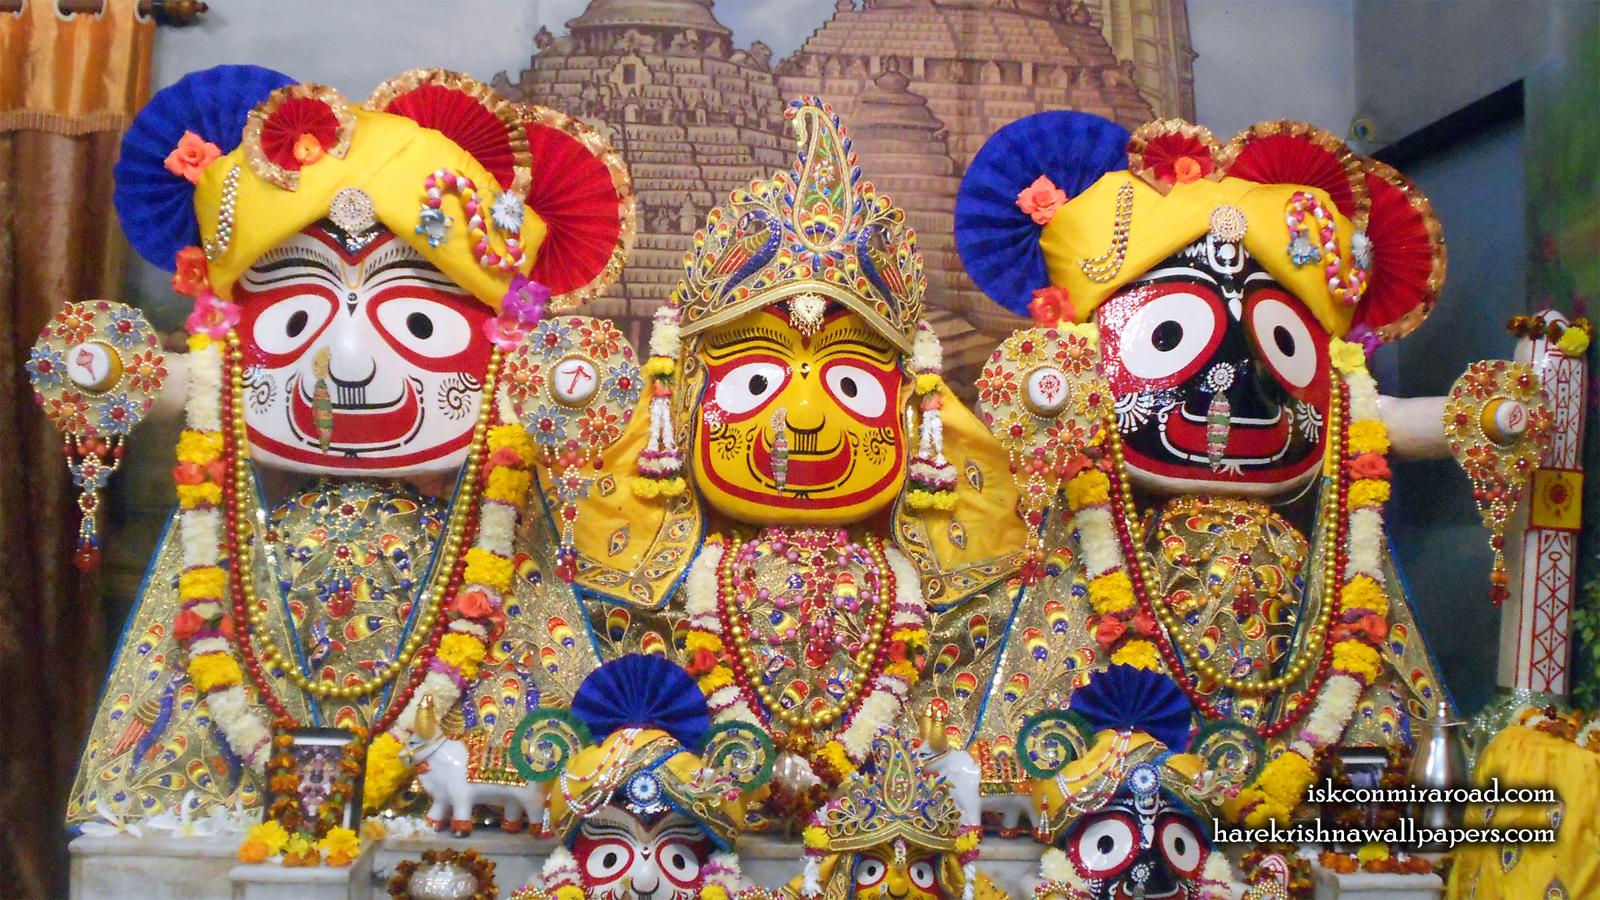 Jagannath Baladeva Subhadra Wallpaper (003) Size 1600x900 Download